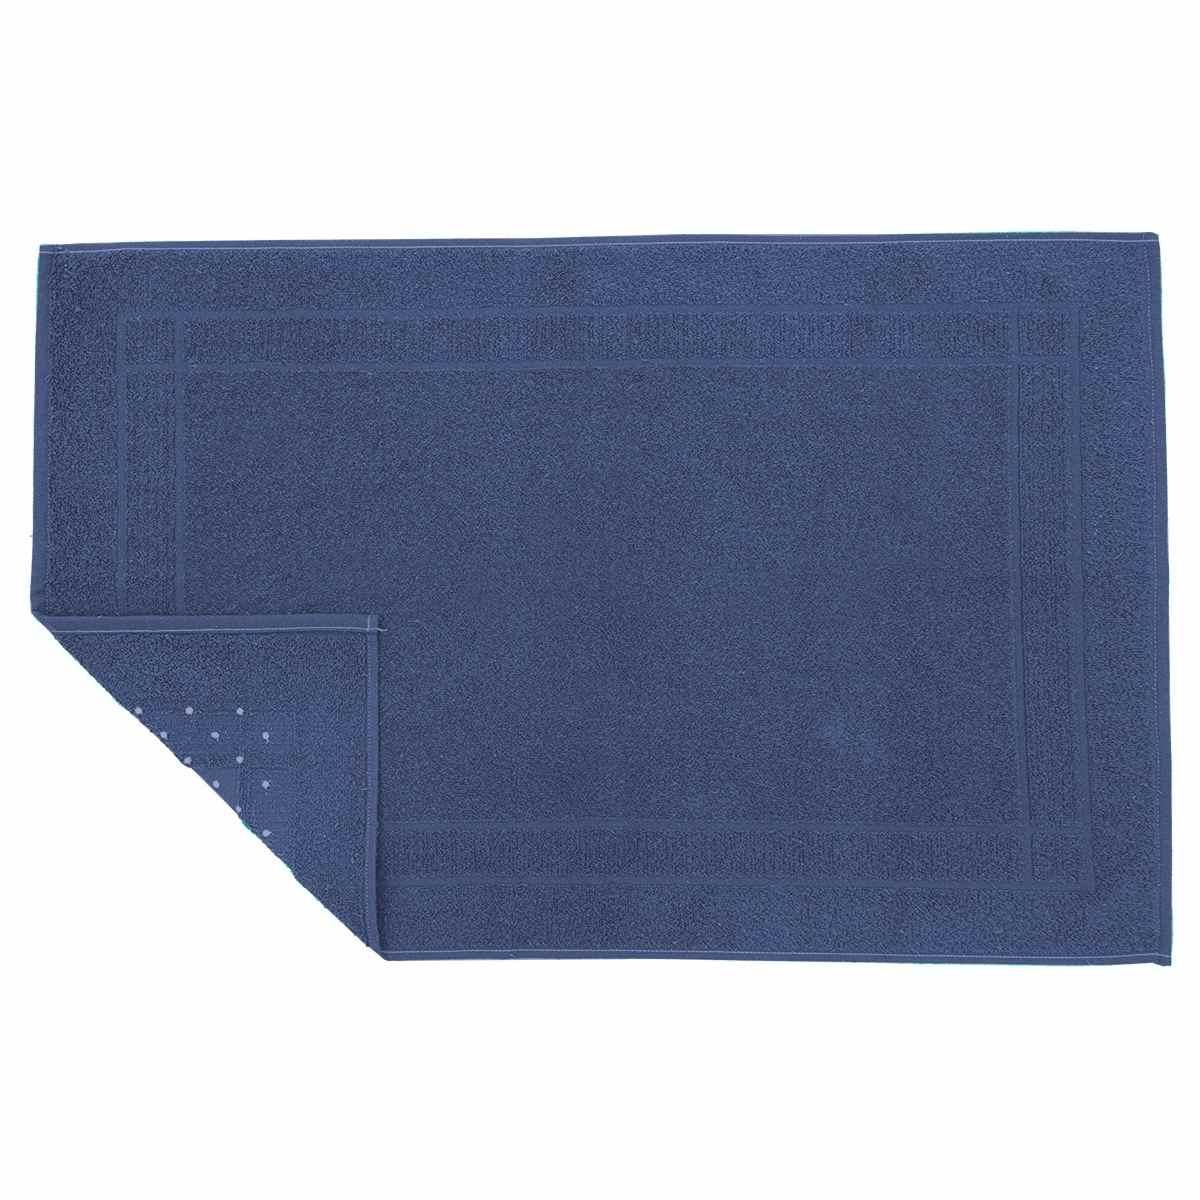 Piso sofisticata 50x75 Azul Marinho